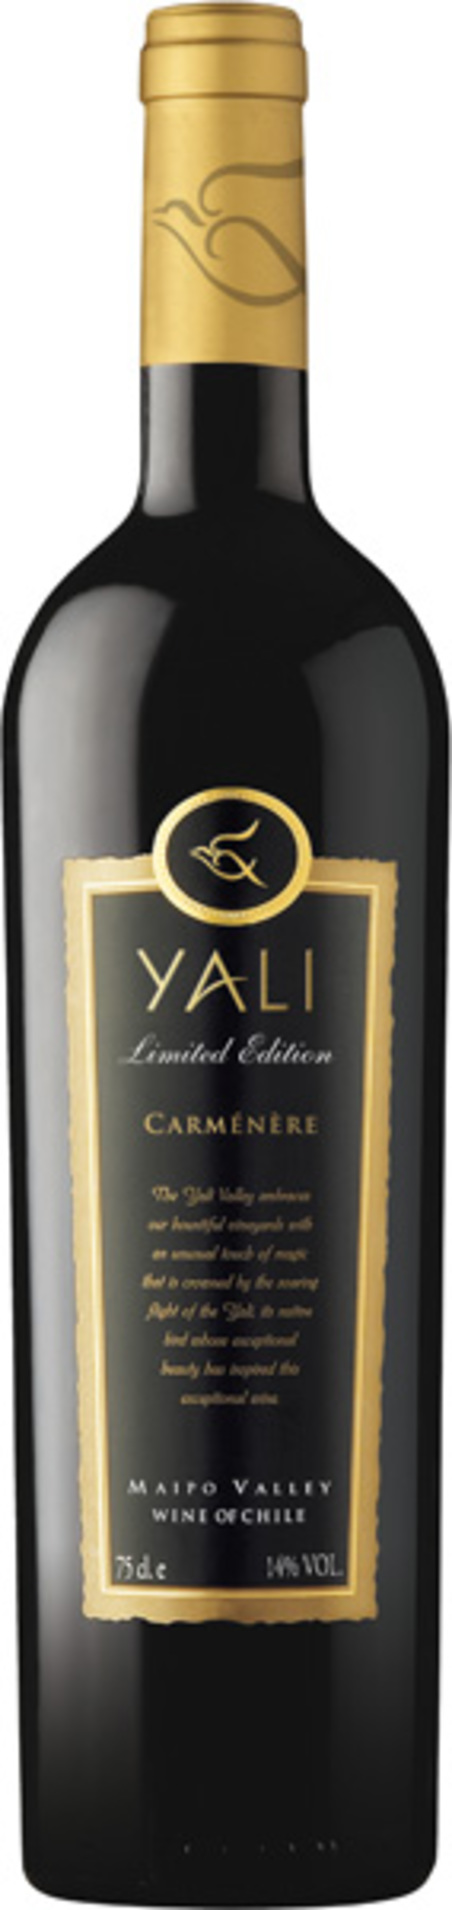 vinho yali - limited edition carmenere - tinto